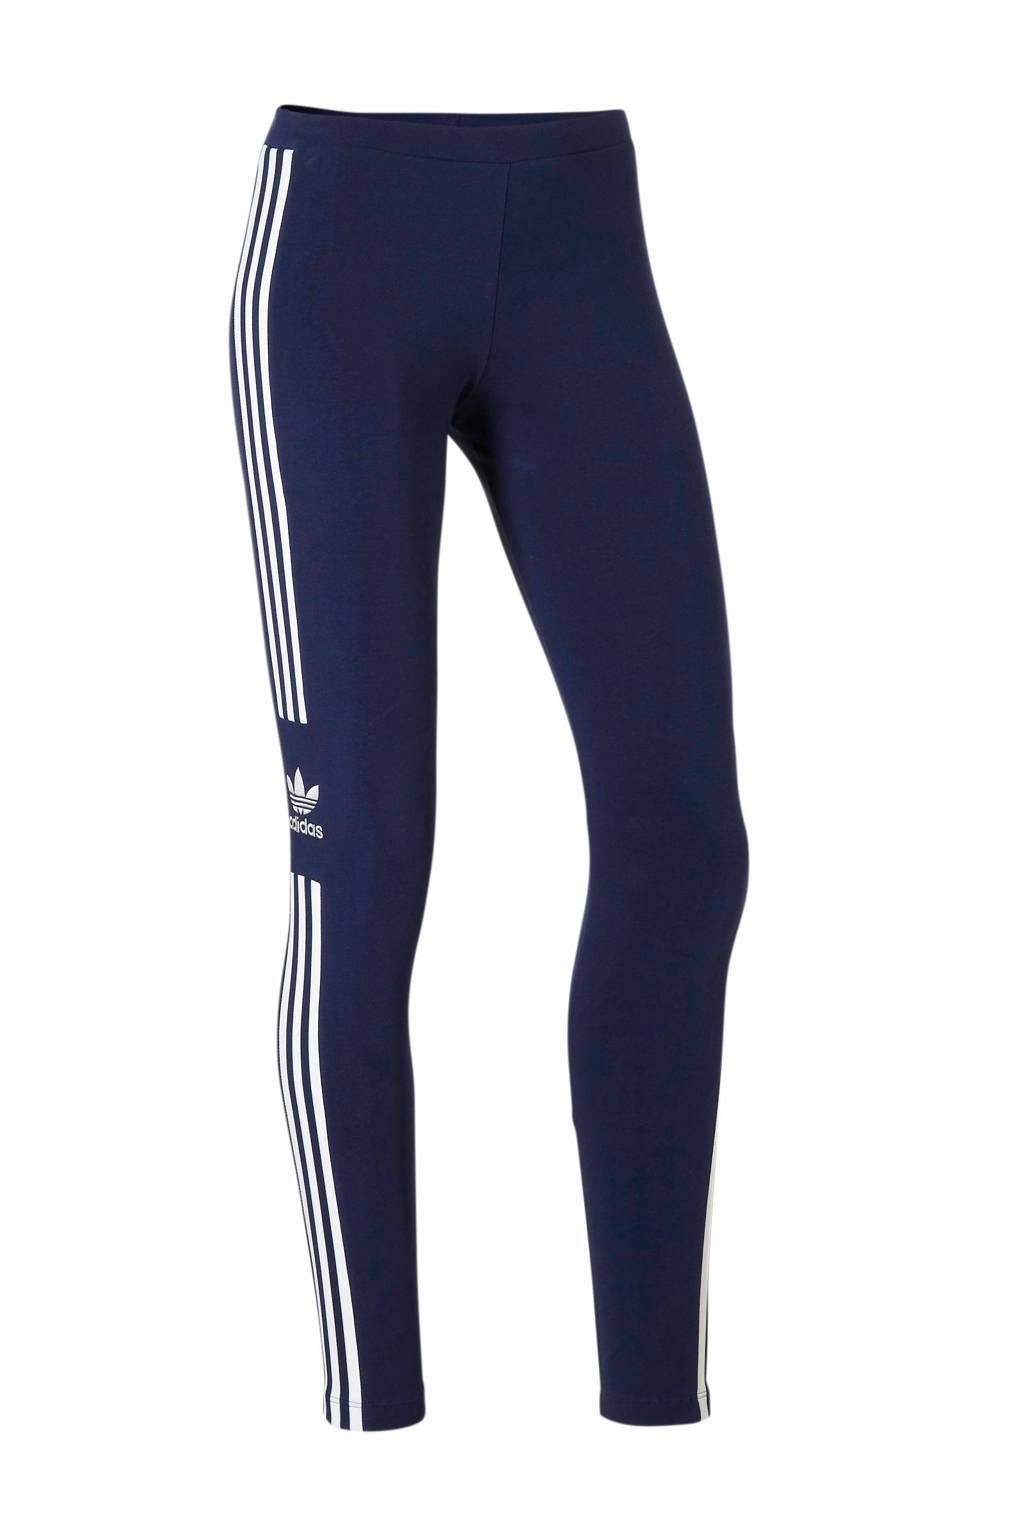 adidas originals 7/8 legging donkerblauw, Donkerblauw/wit